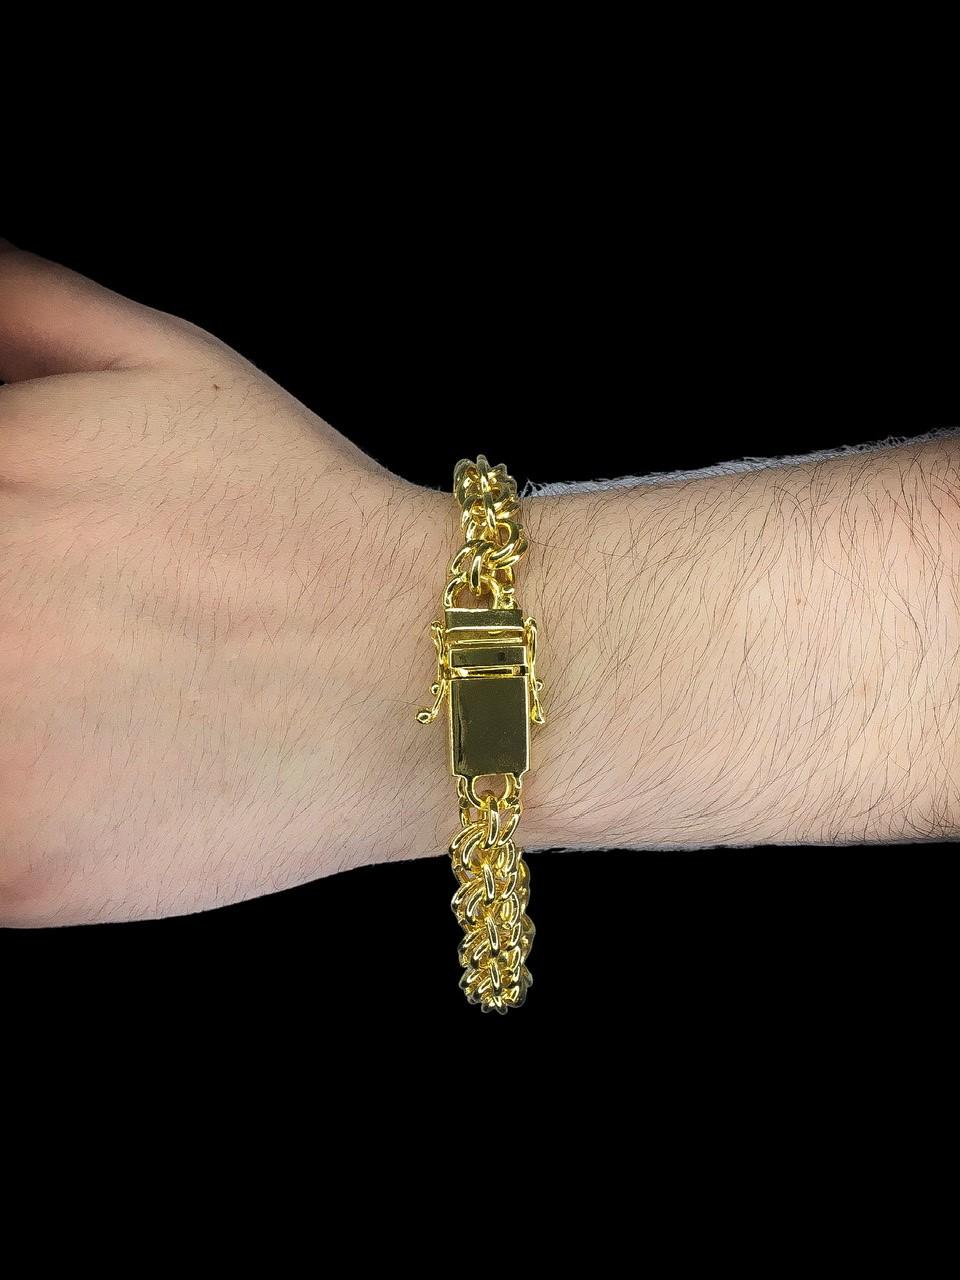 Pulseira friso duplo  -  9 milímetros - 22 Centímetros - fecho gaveta trava dupla - Banhado a ouro 18 k